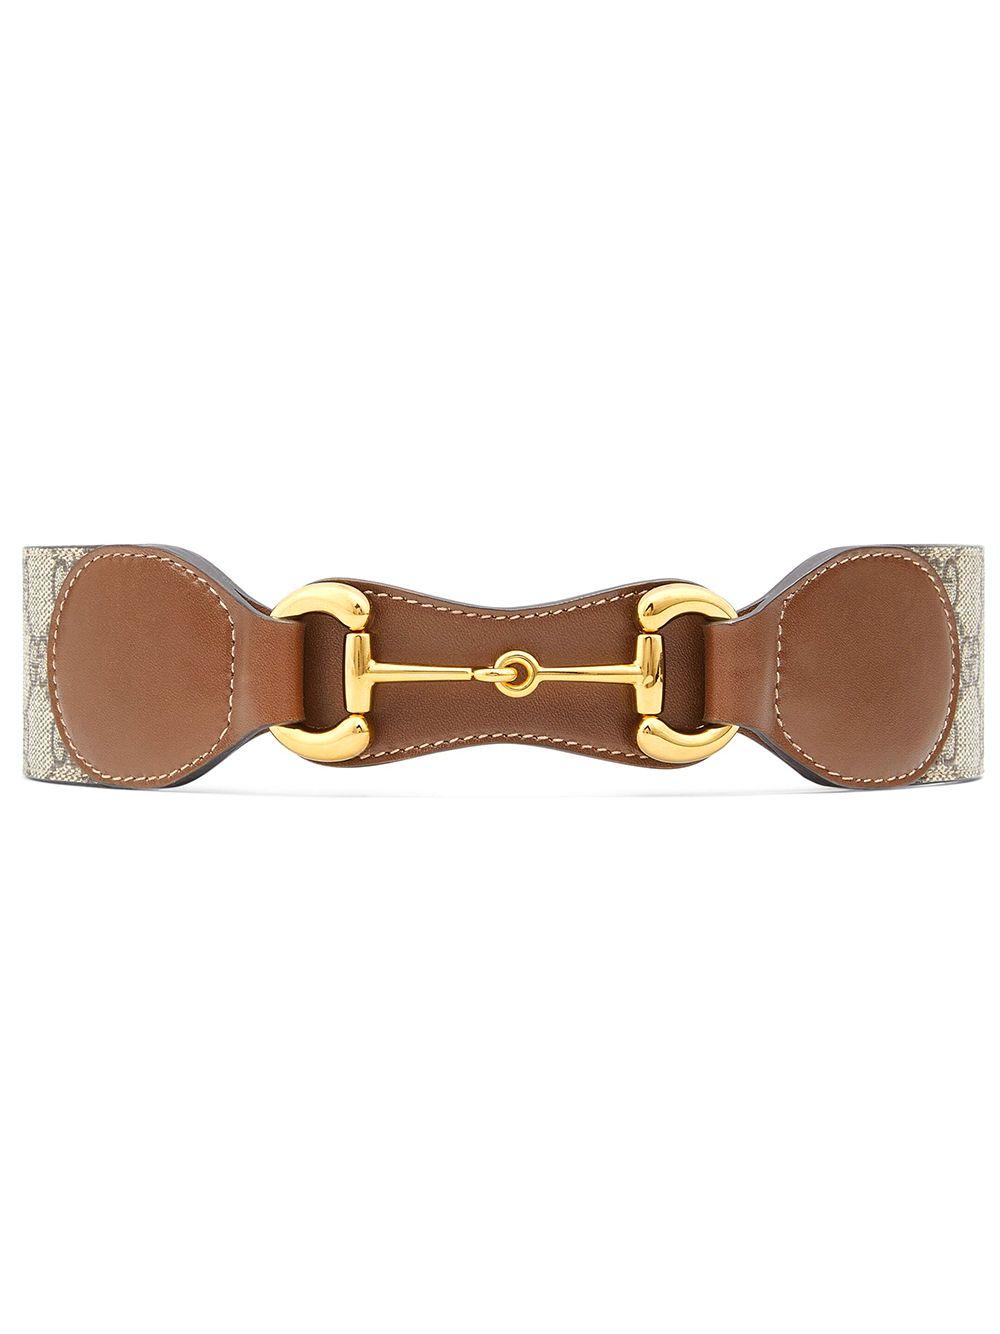 Horsebit Leather Belt